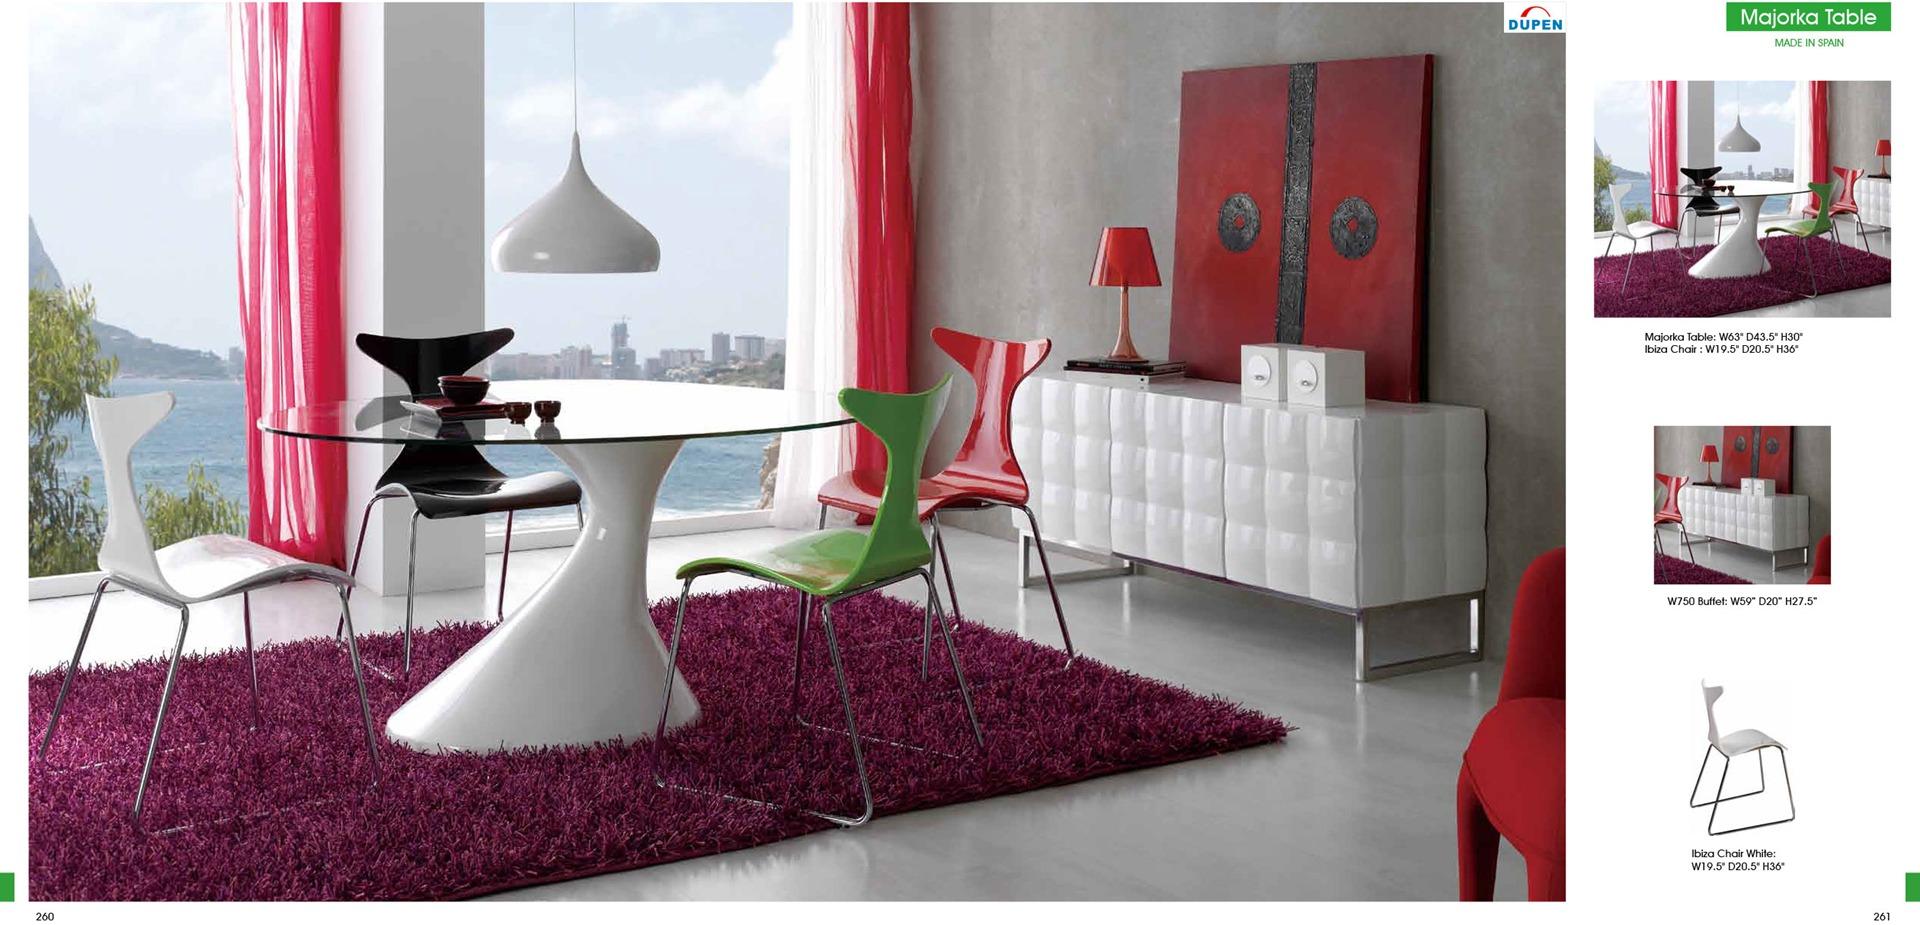 Dining Room Furniture Sets Arte Interiors Chicago Furniture - Colorful modern dining room